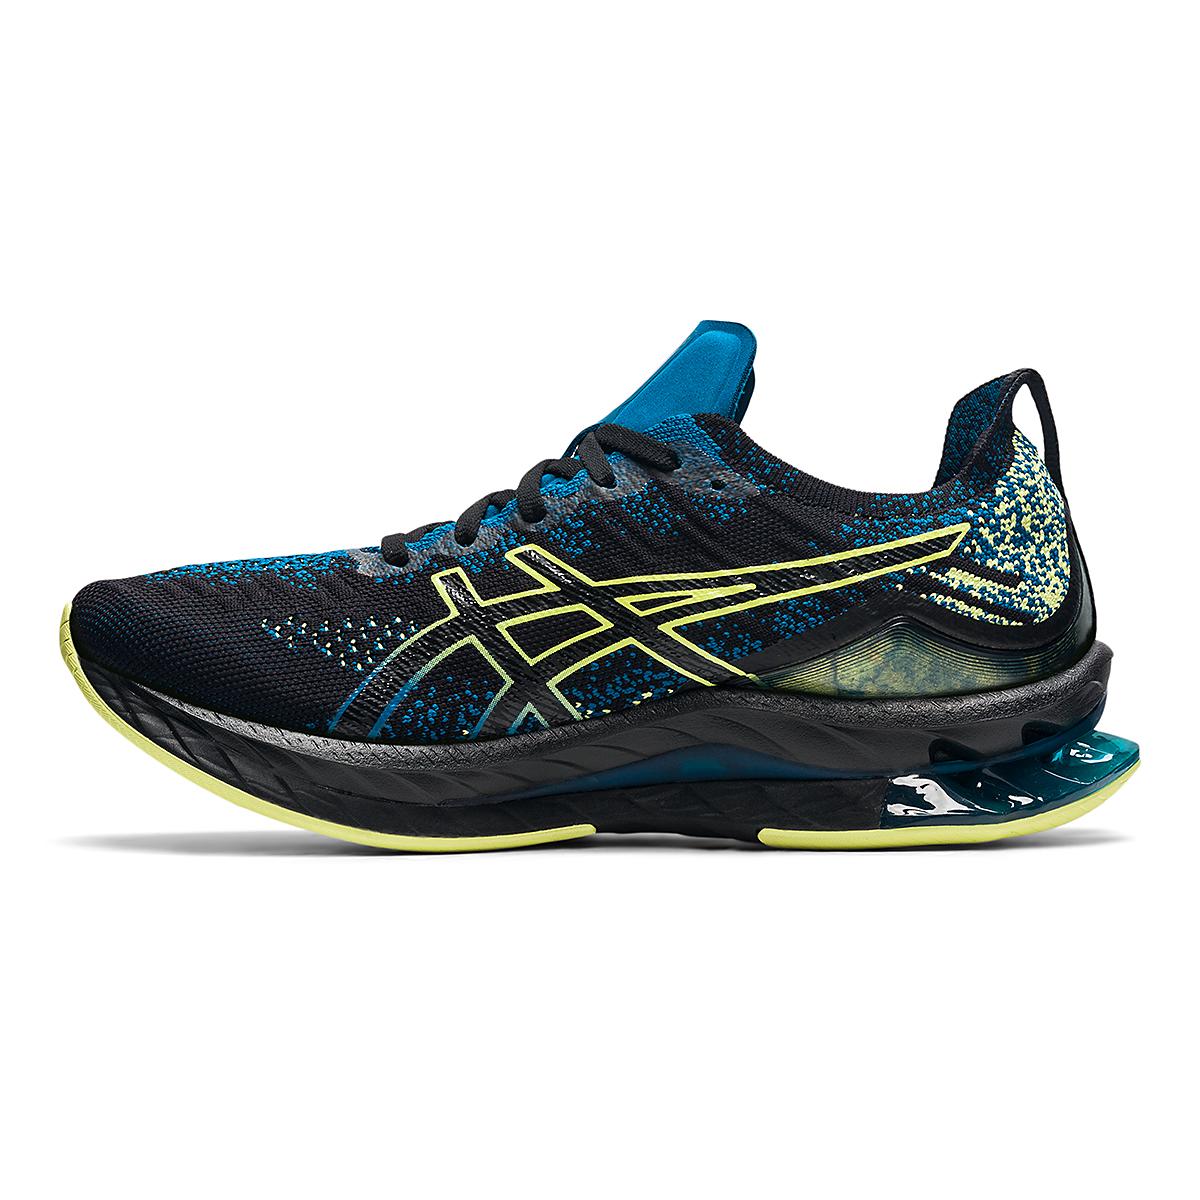 Men's Asics Kinsei Blast Running Shoe - Color: Black/Glow Yellow - Size: 6 - Width: Regular, Black/Glow Yellow, large, image 2